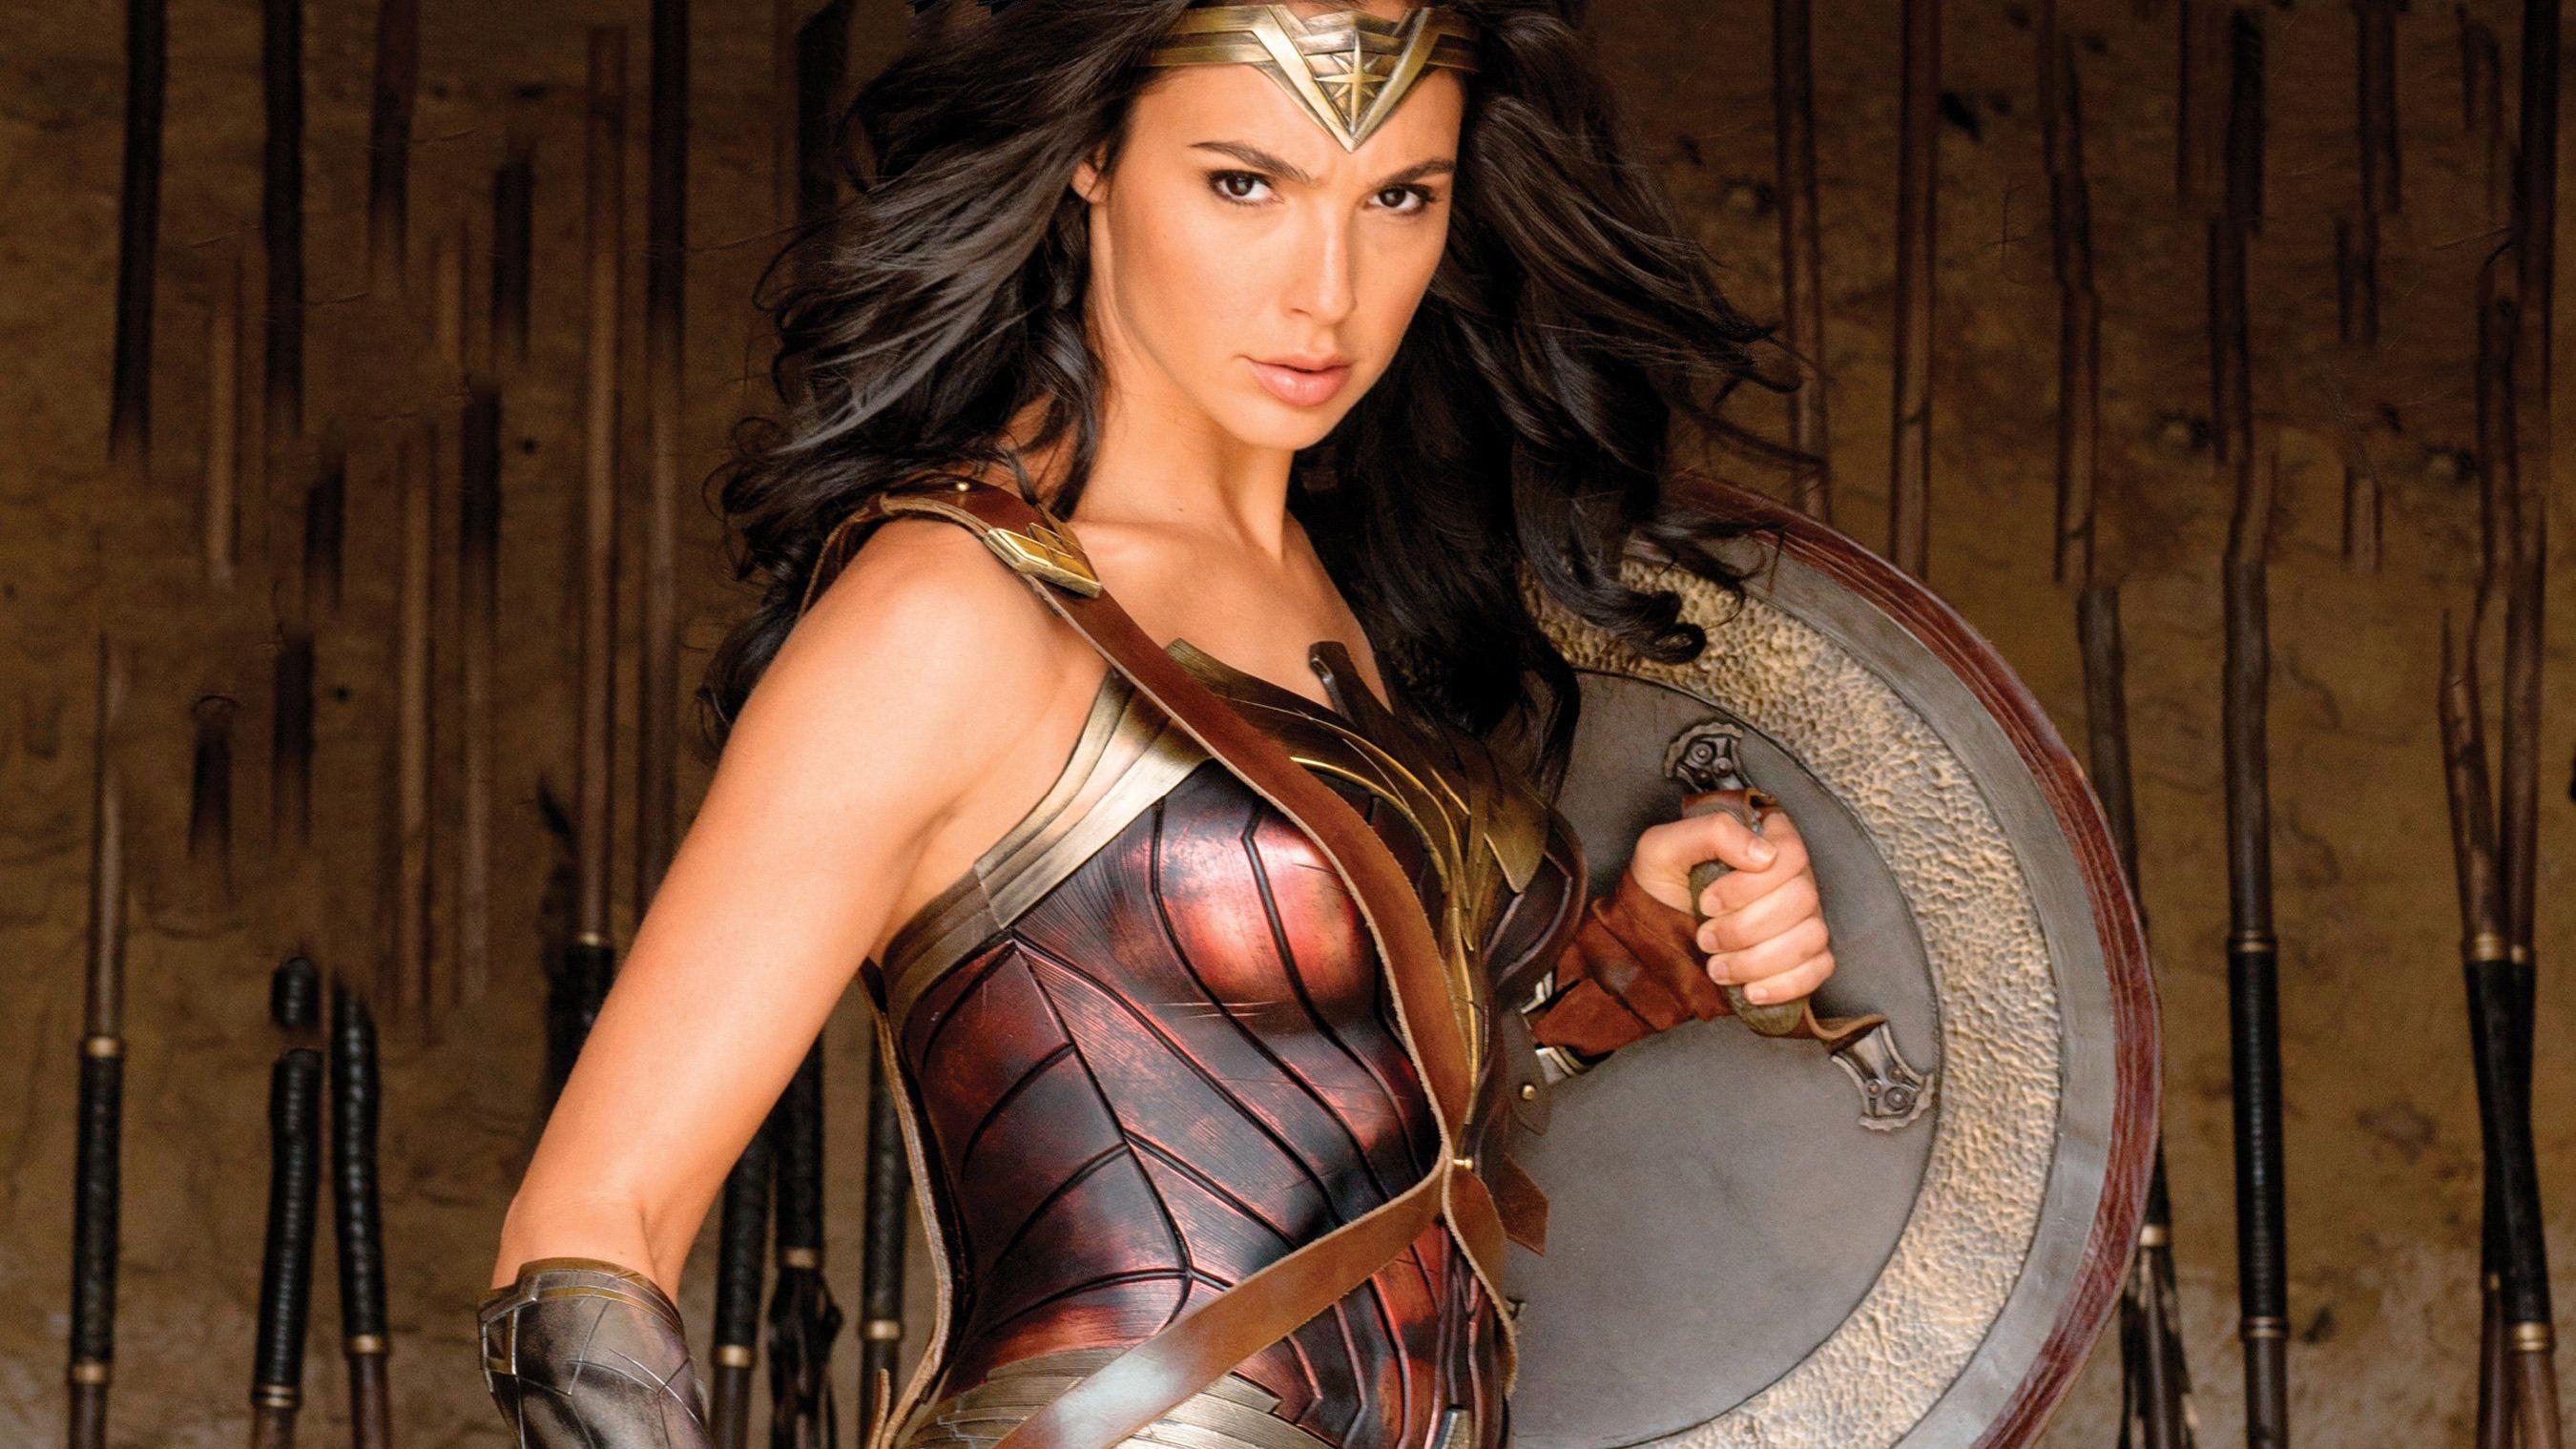 Wallpaper Gal Gadot Wonder Woman Hd Movies 7553: Wonder Woman With Shield, HD Movies, 4k Wallpapers, Images